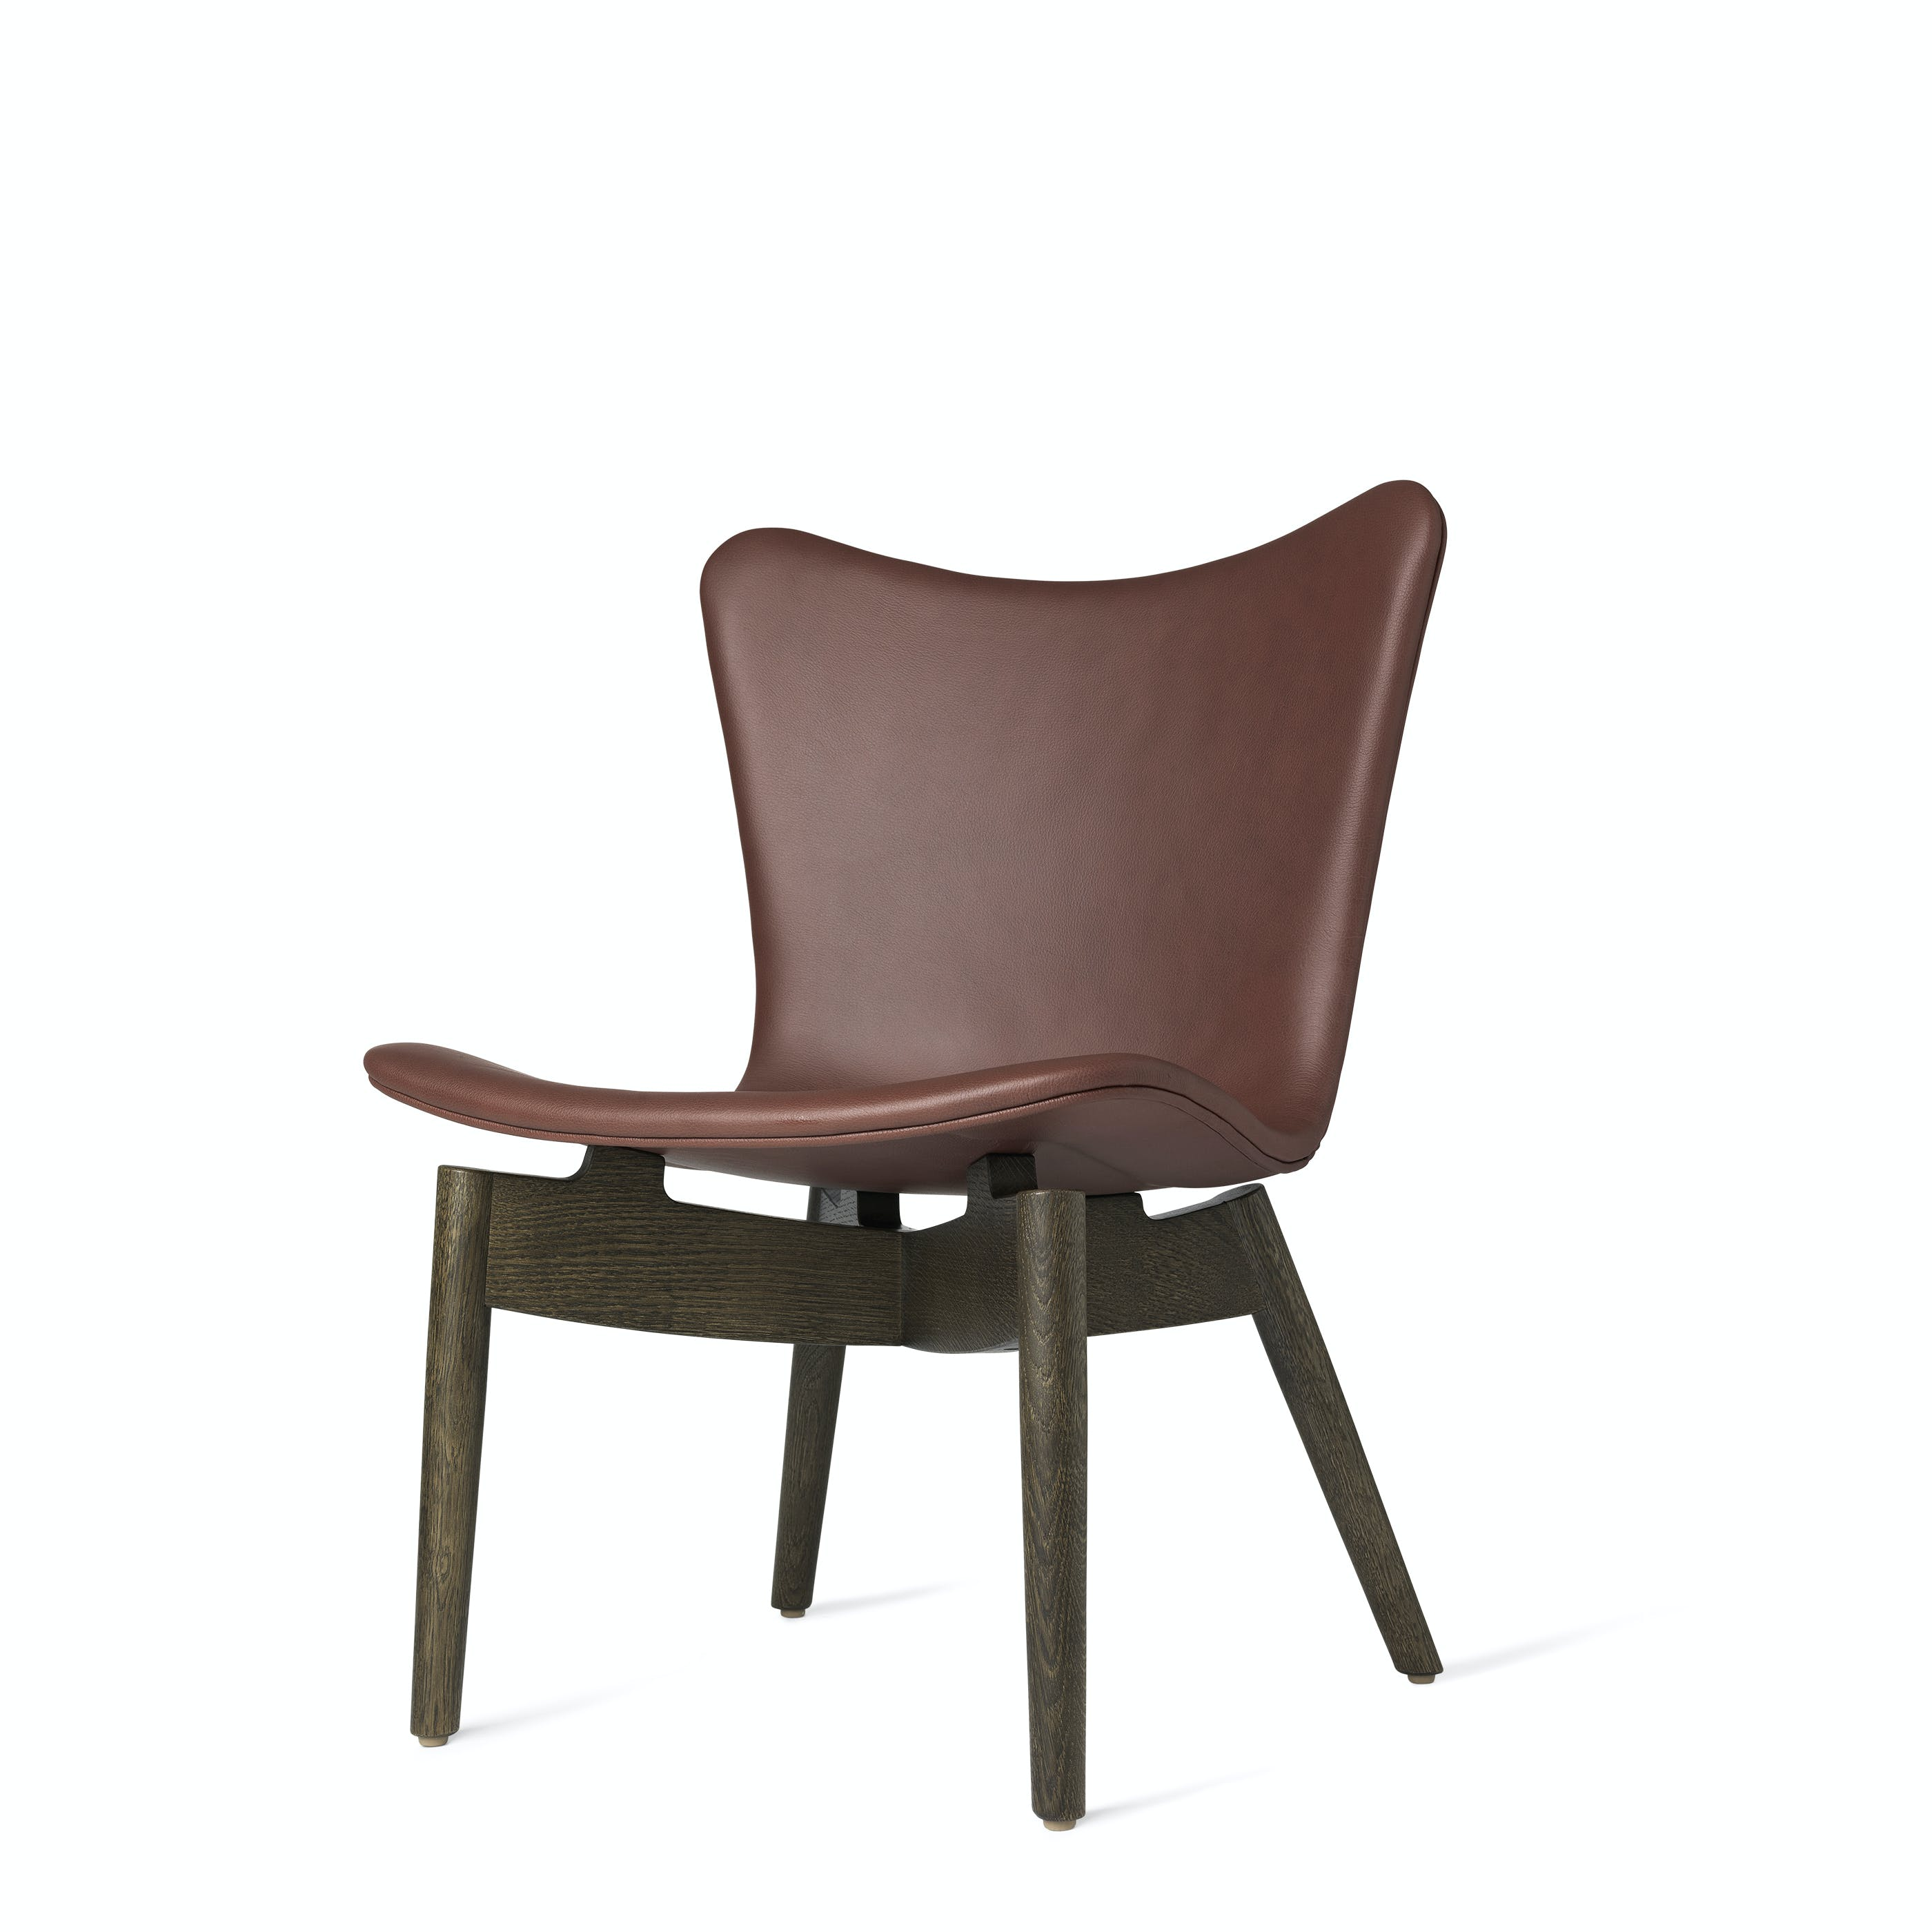 Mater Cognac Shell Lounge Chair Stained Beech Legs Haute Living